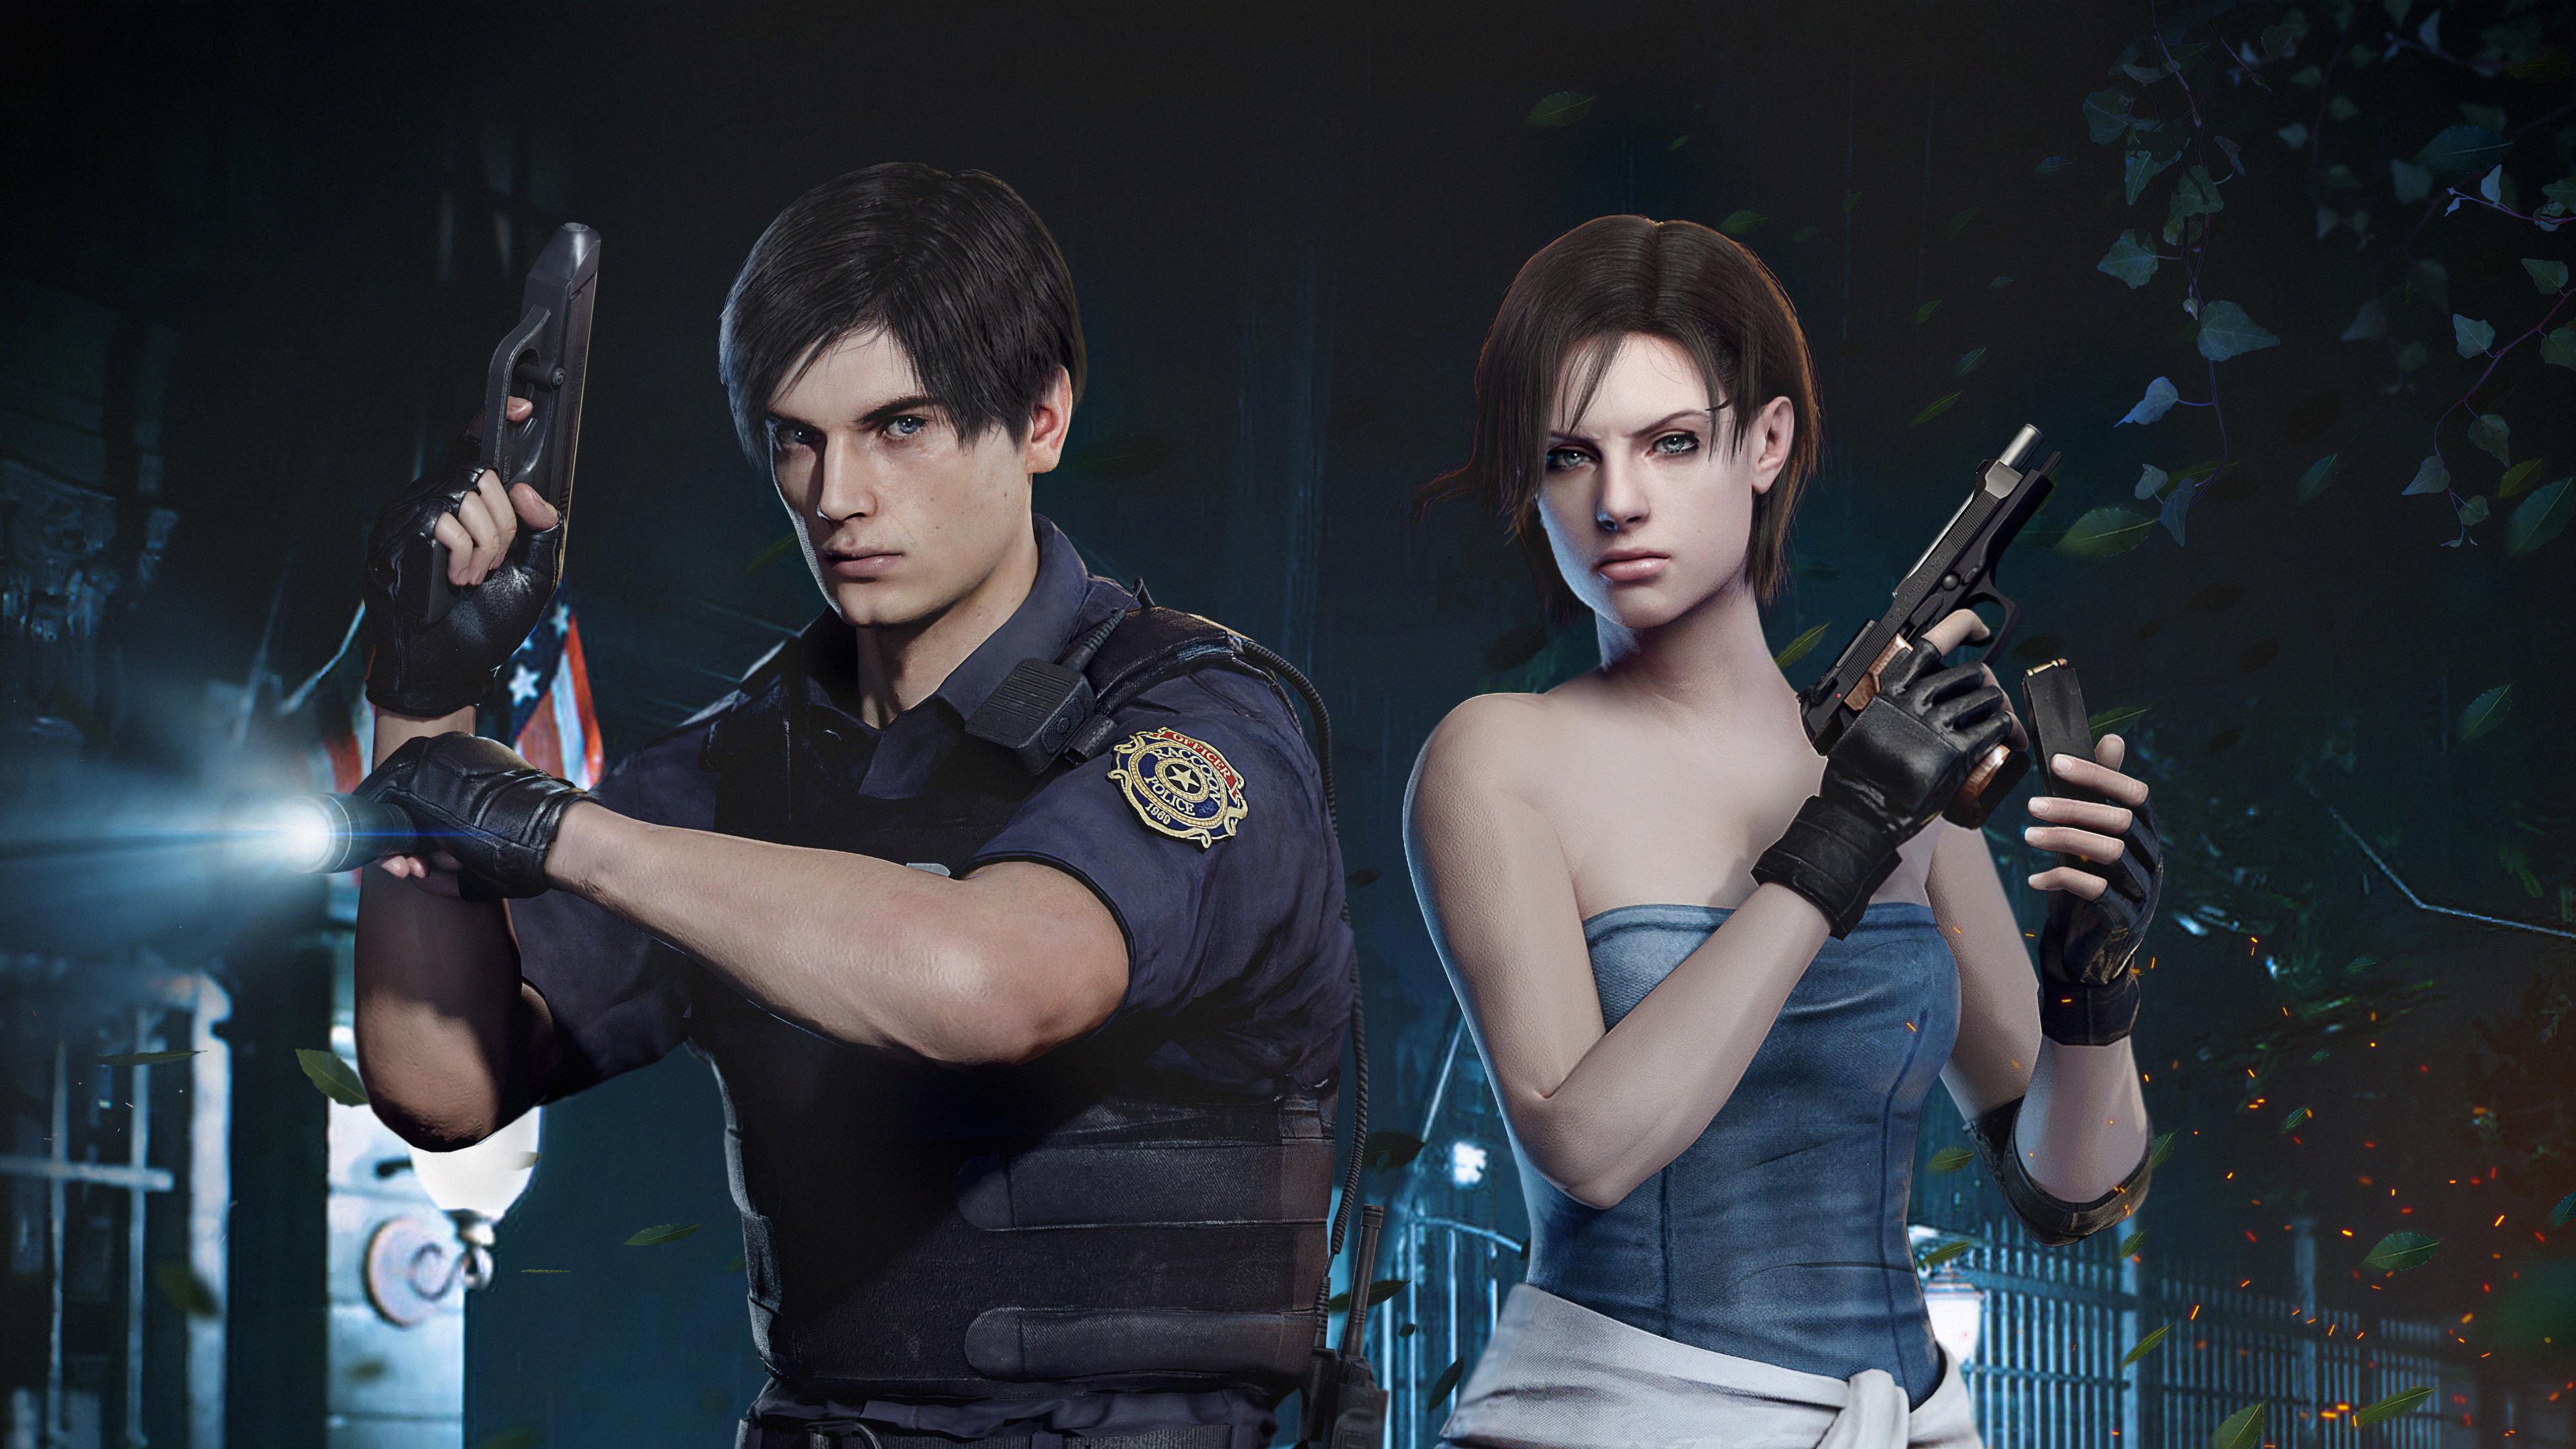 Resident Evil Leon X Jil 4k, HD Games, 4k Wallpapers ...